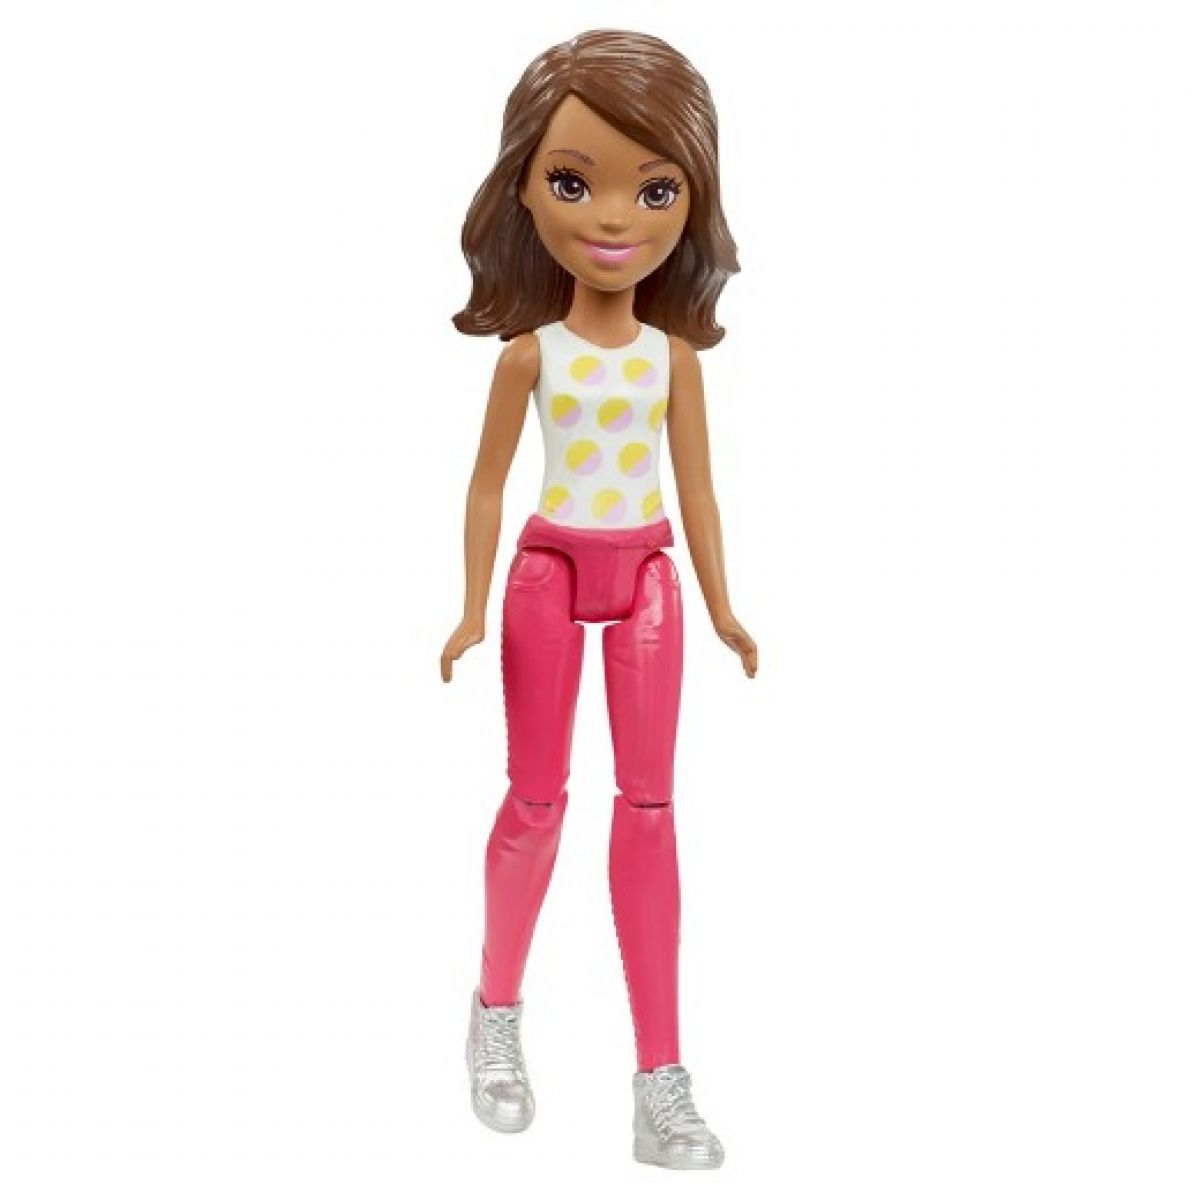 Mattel Barbie Mini panenka červené kalhoty FHV56